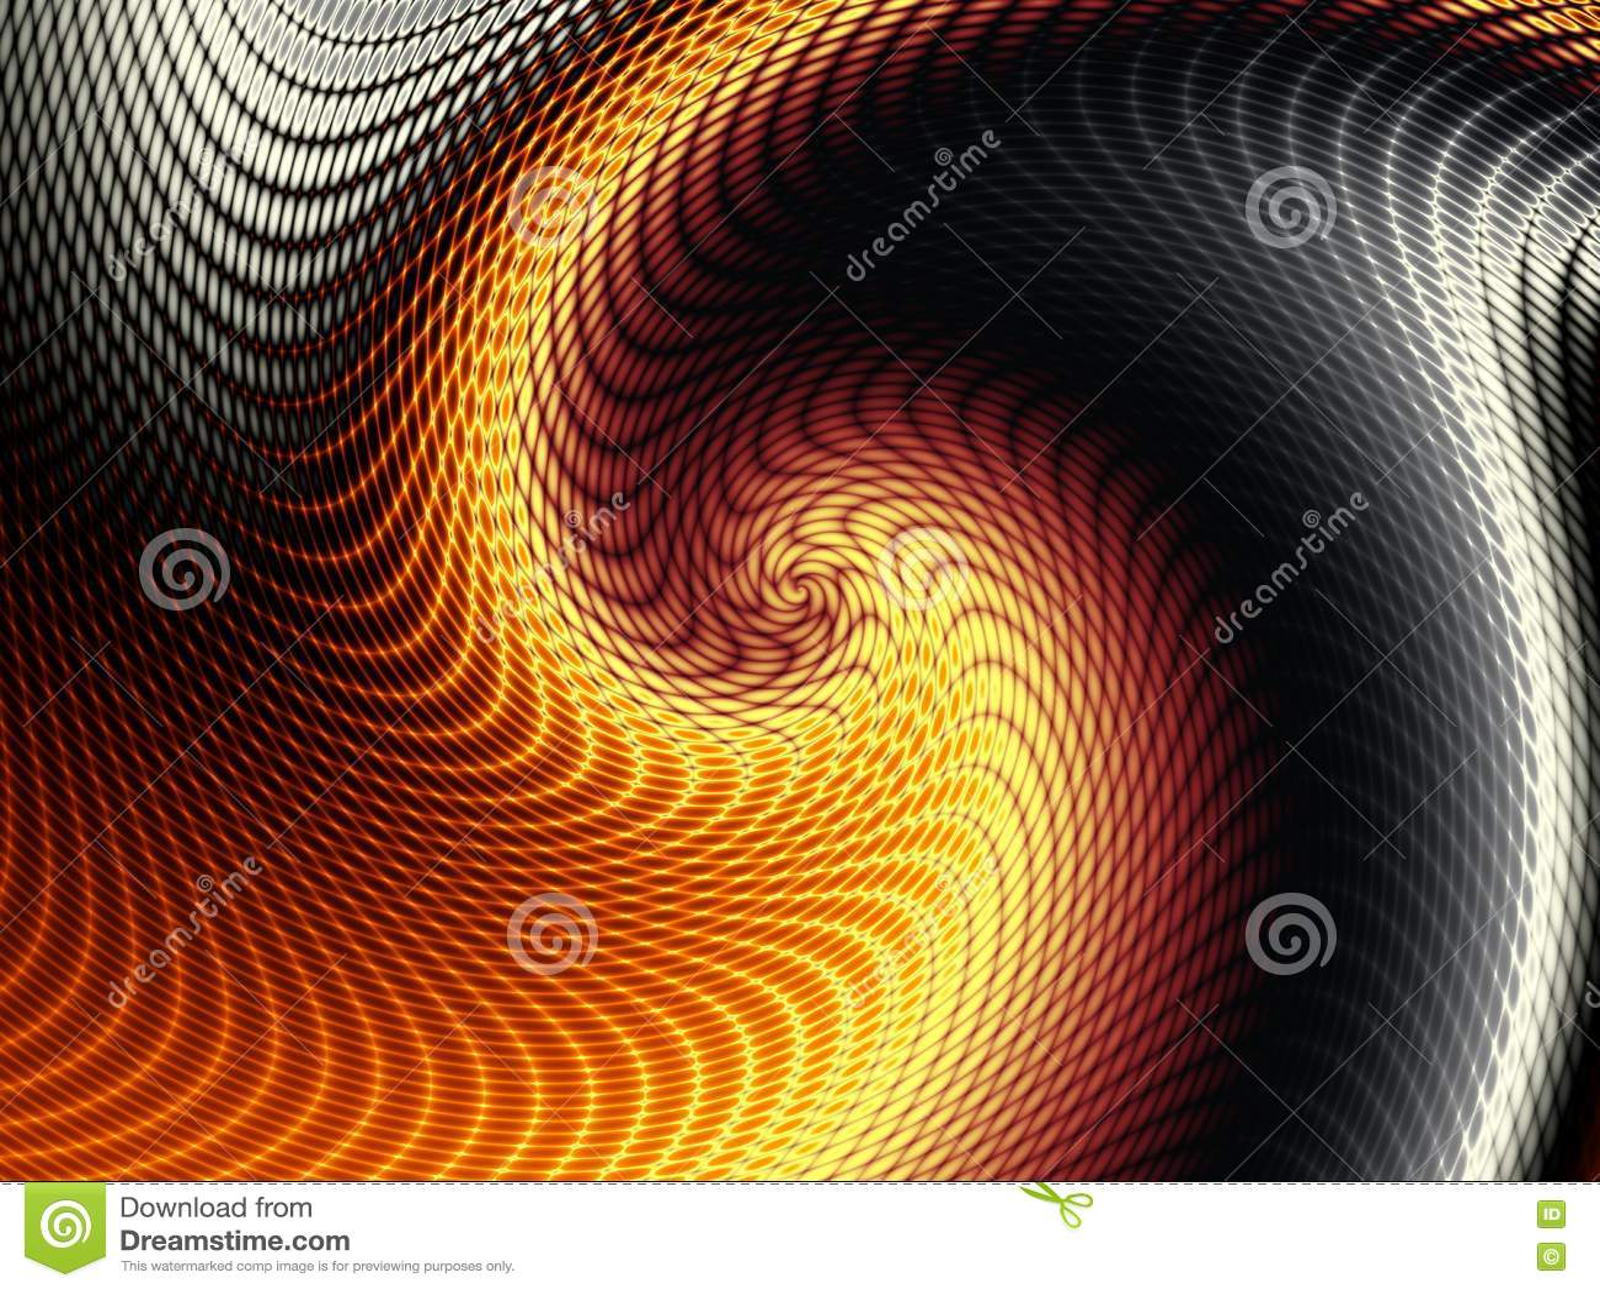 illustration fractal background clocks - photo #23